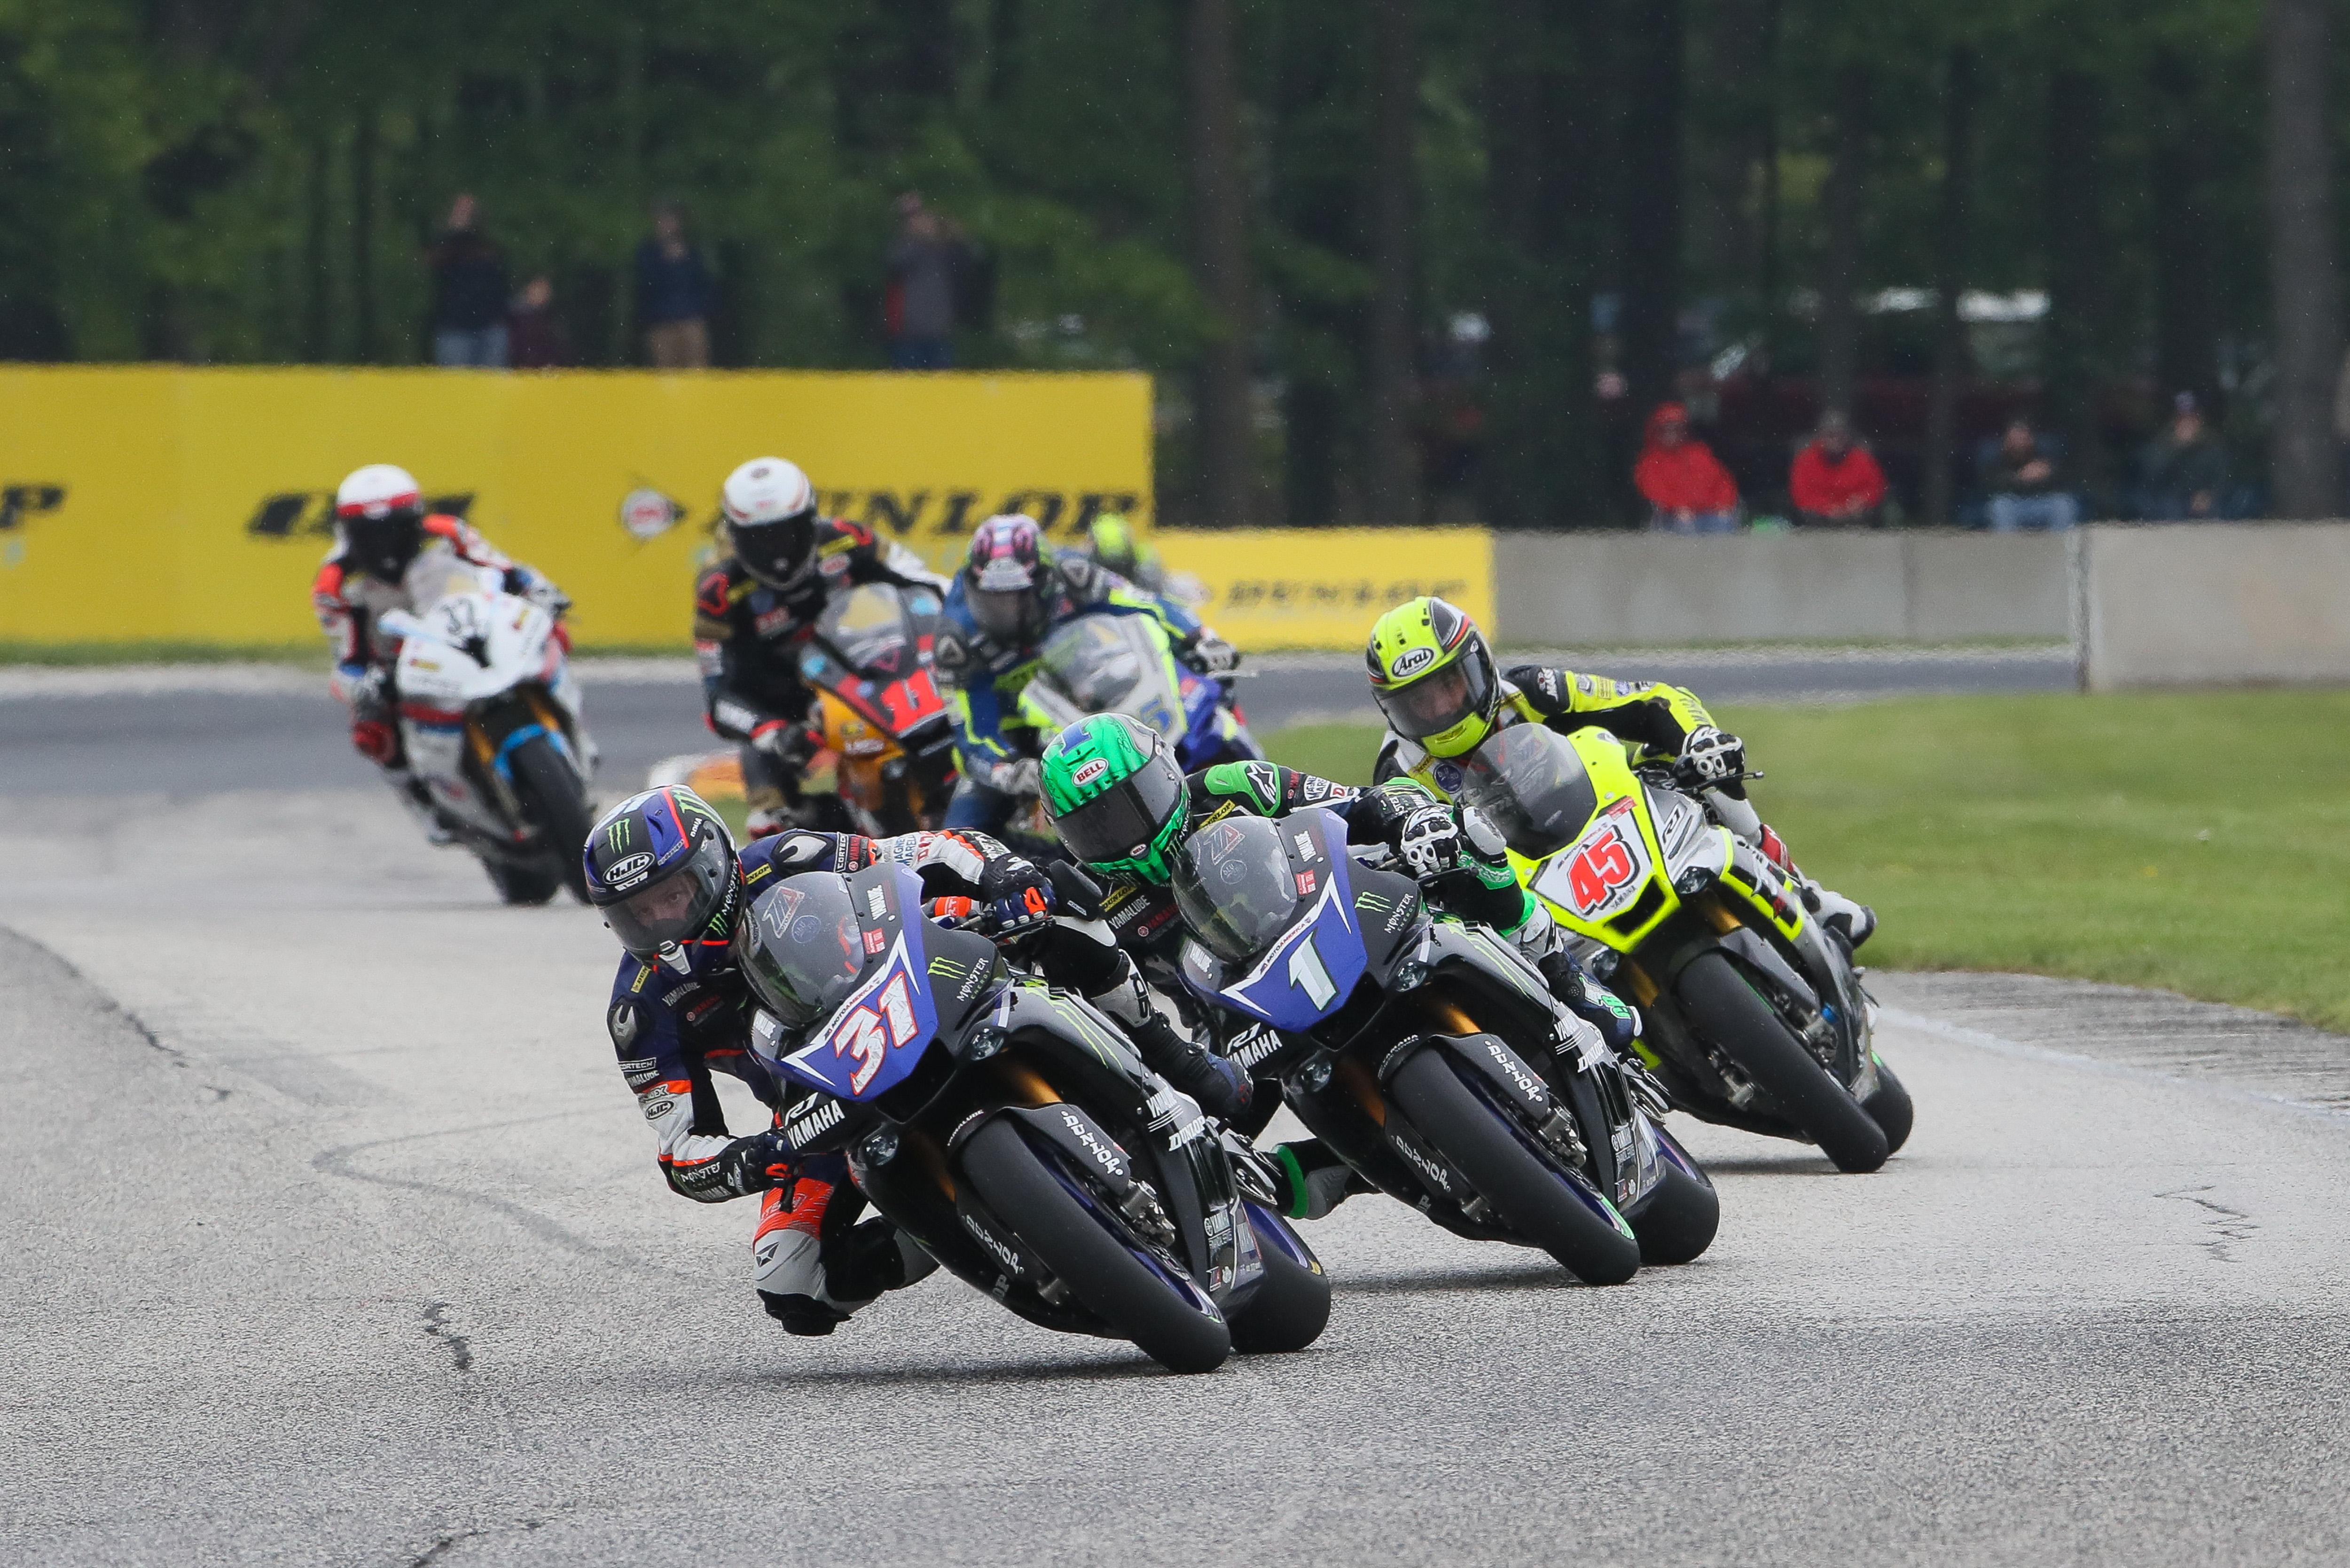 2019 Rd. America SBK Race 1